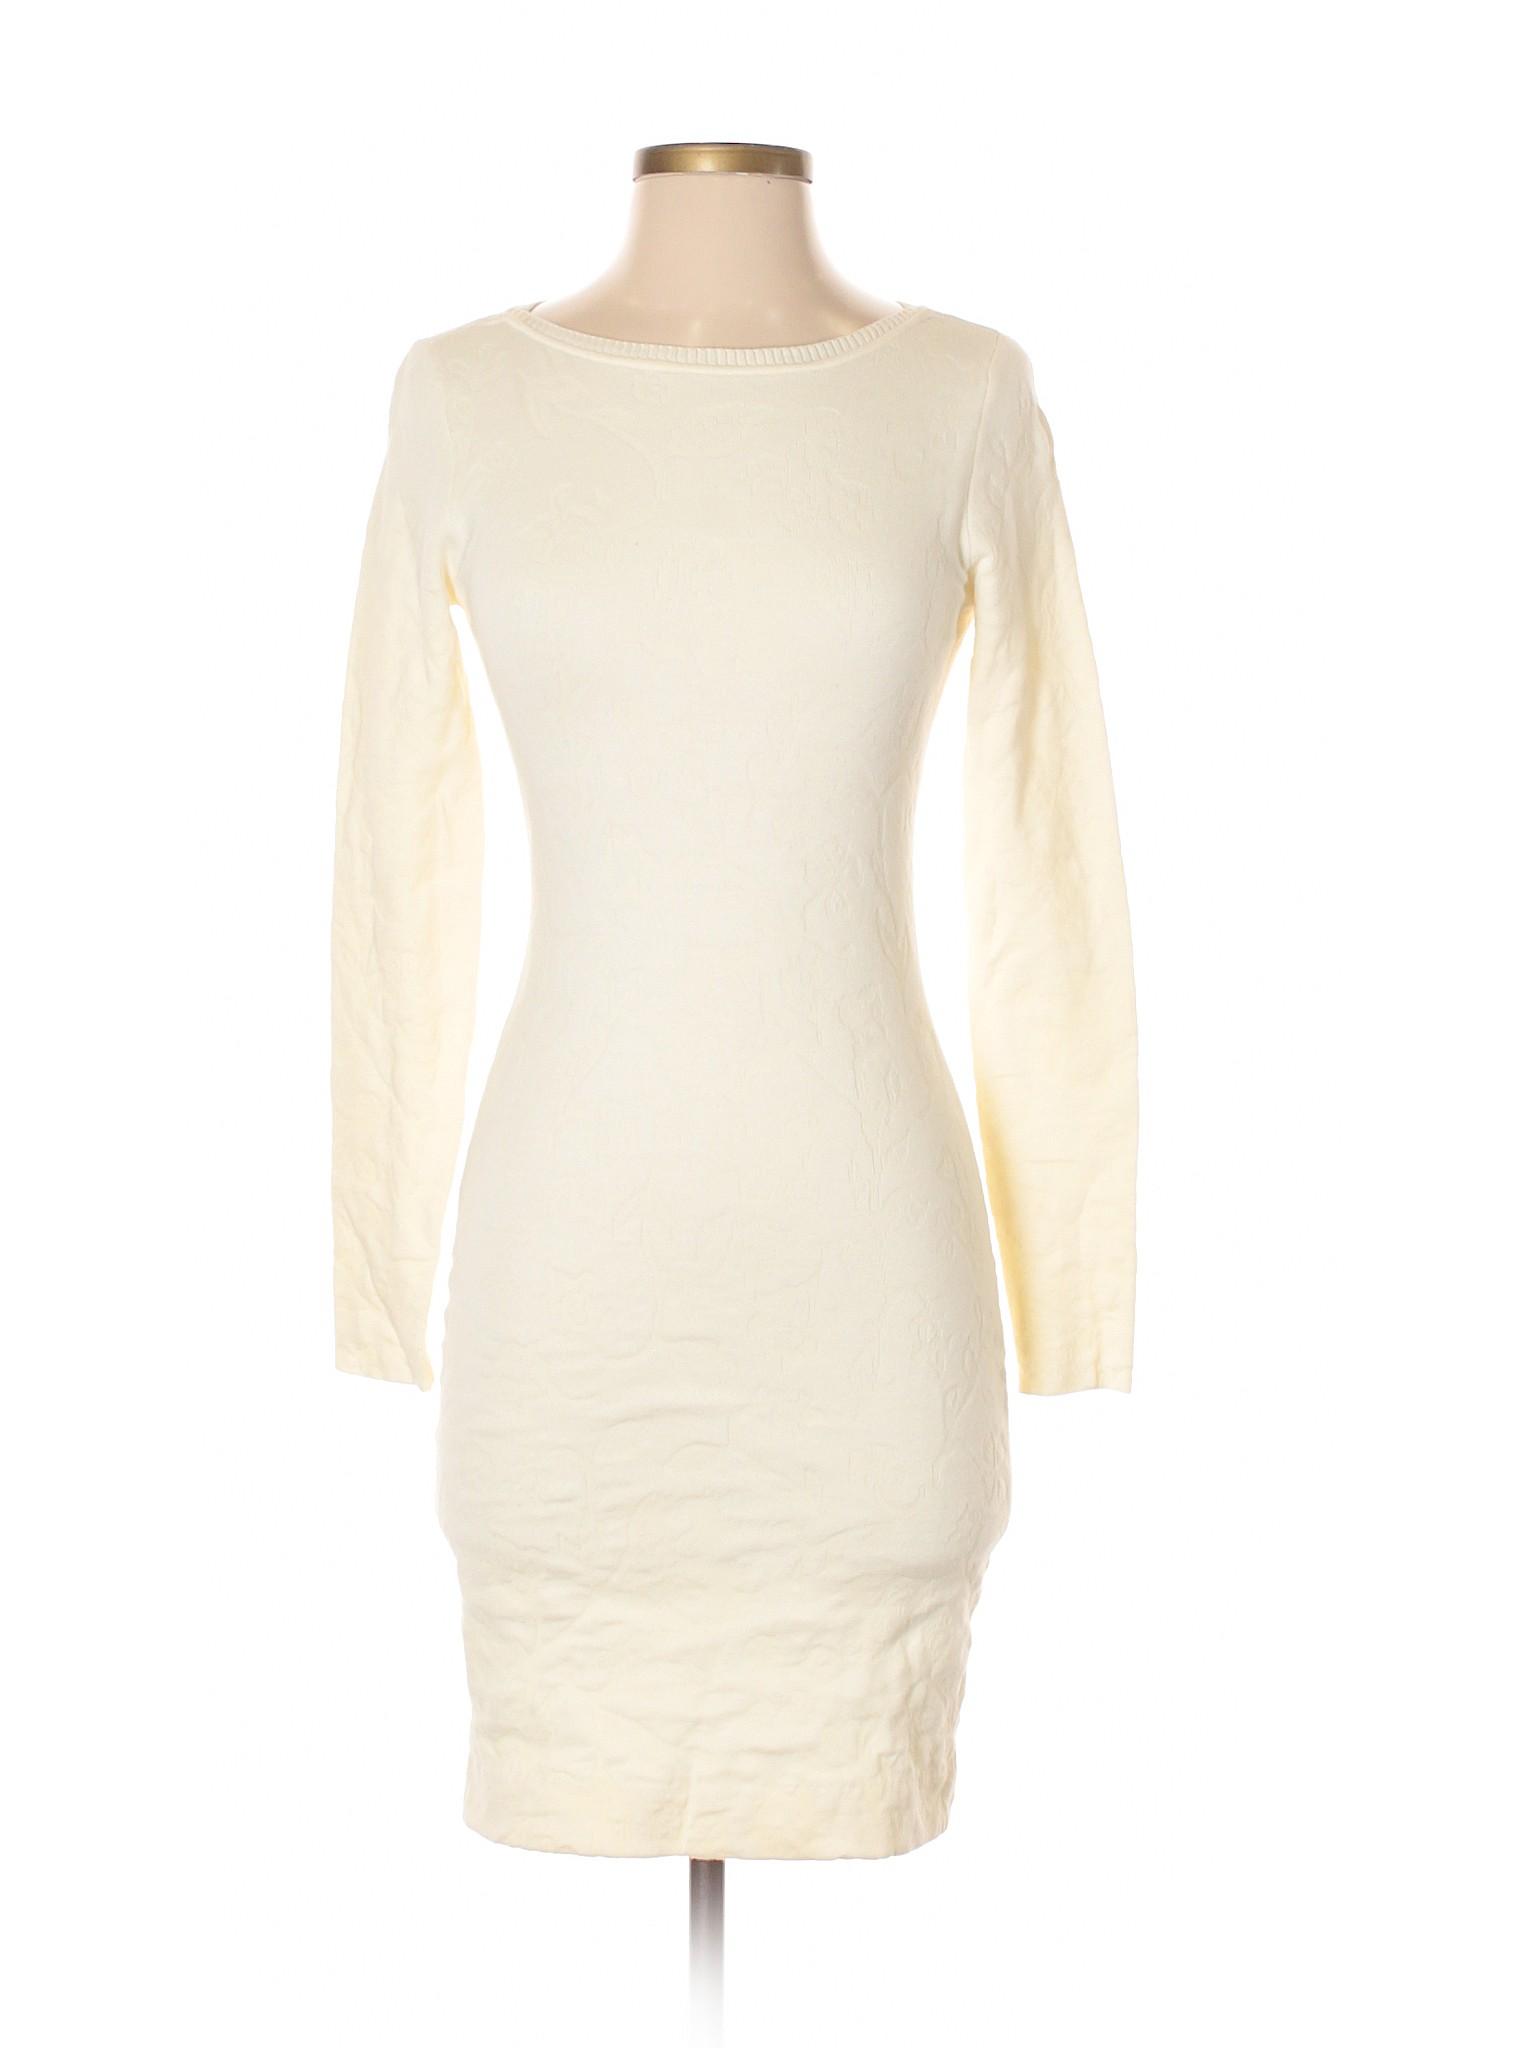 Steffe Casual Selling Selling Dress Cynthia Cynthia SFO1wpzxq1